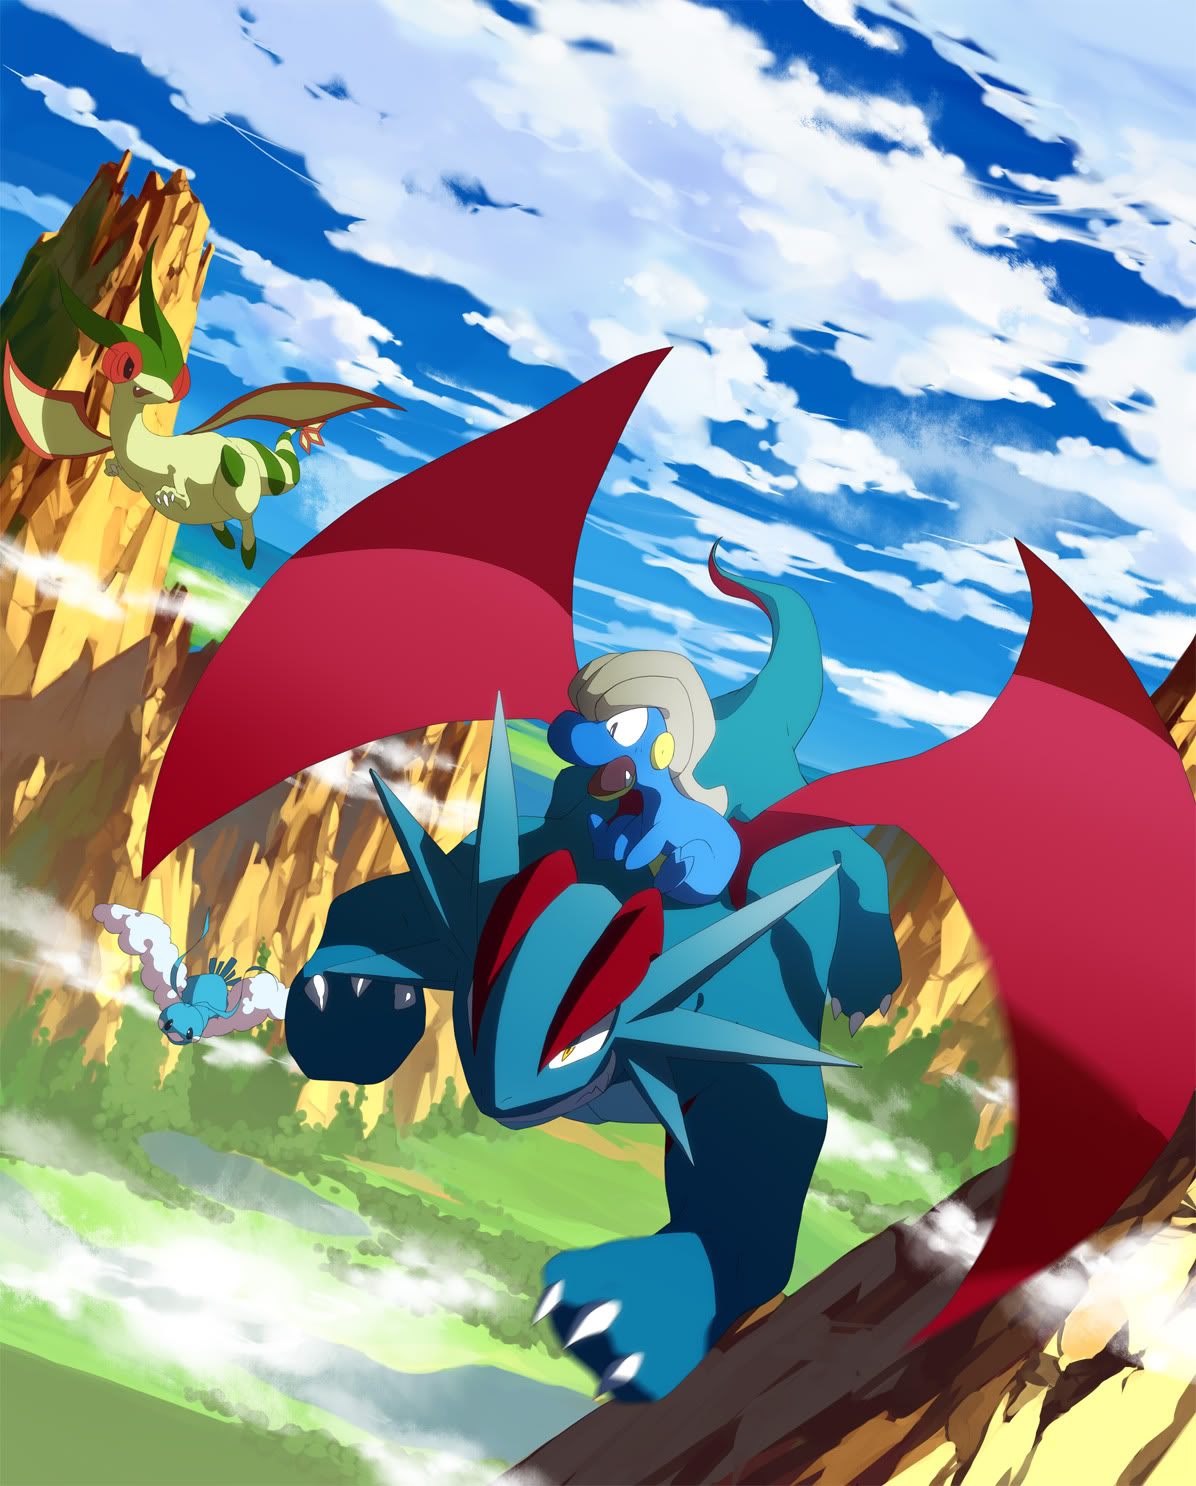 Pokémon Image #230272 - Zerochan Anime Image Board